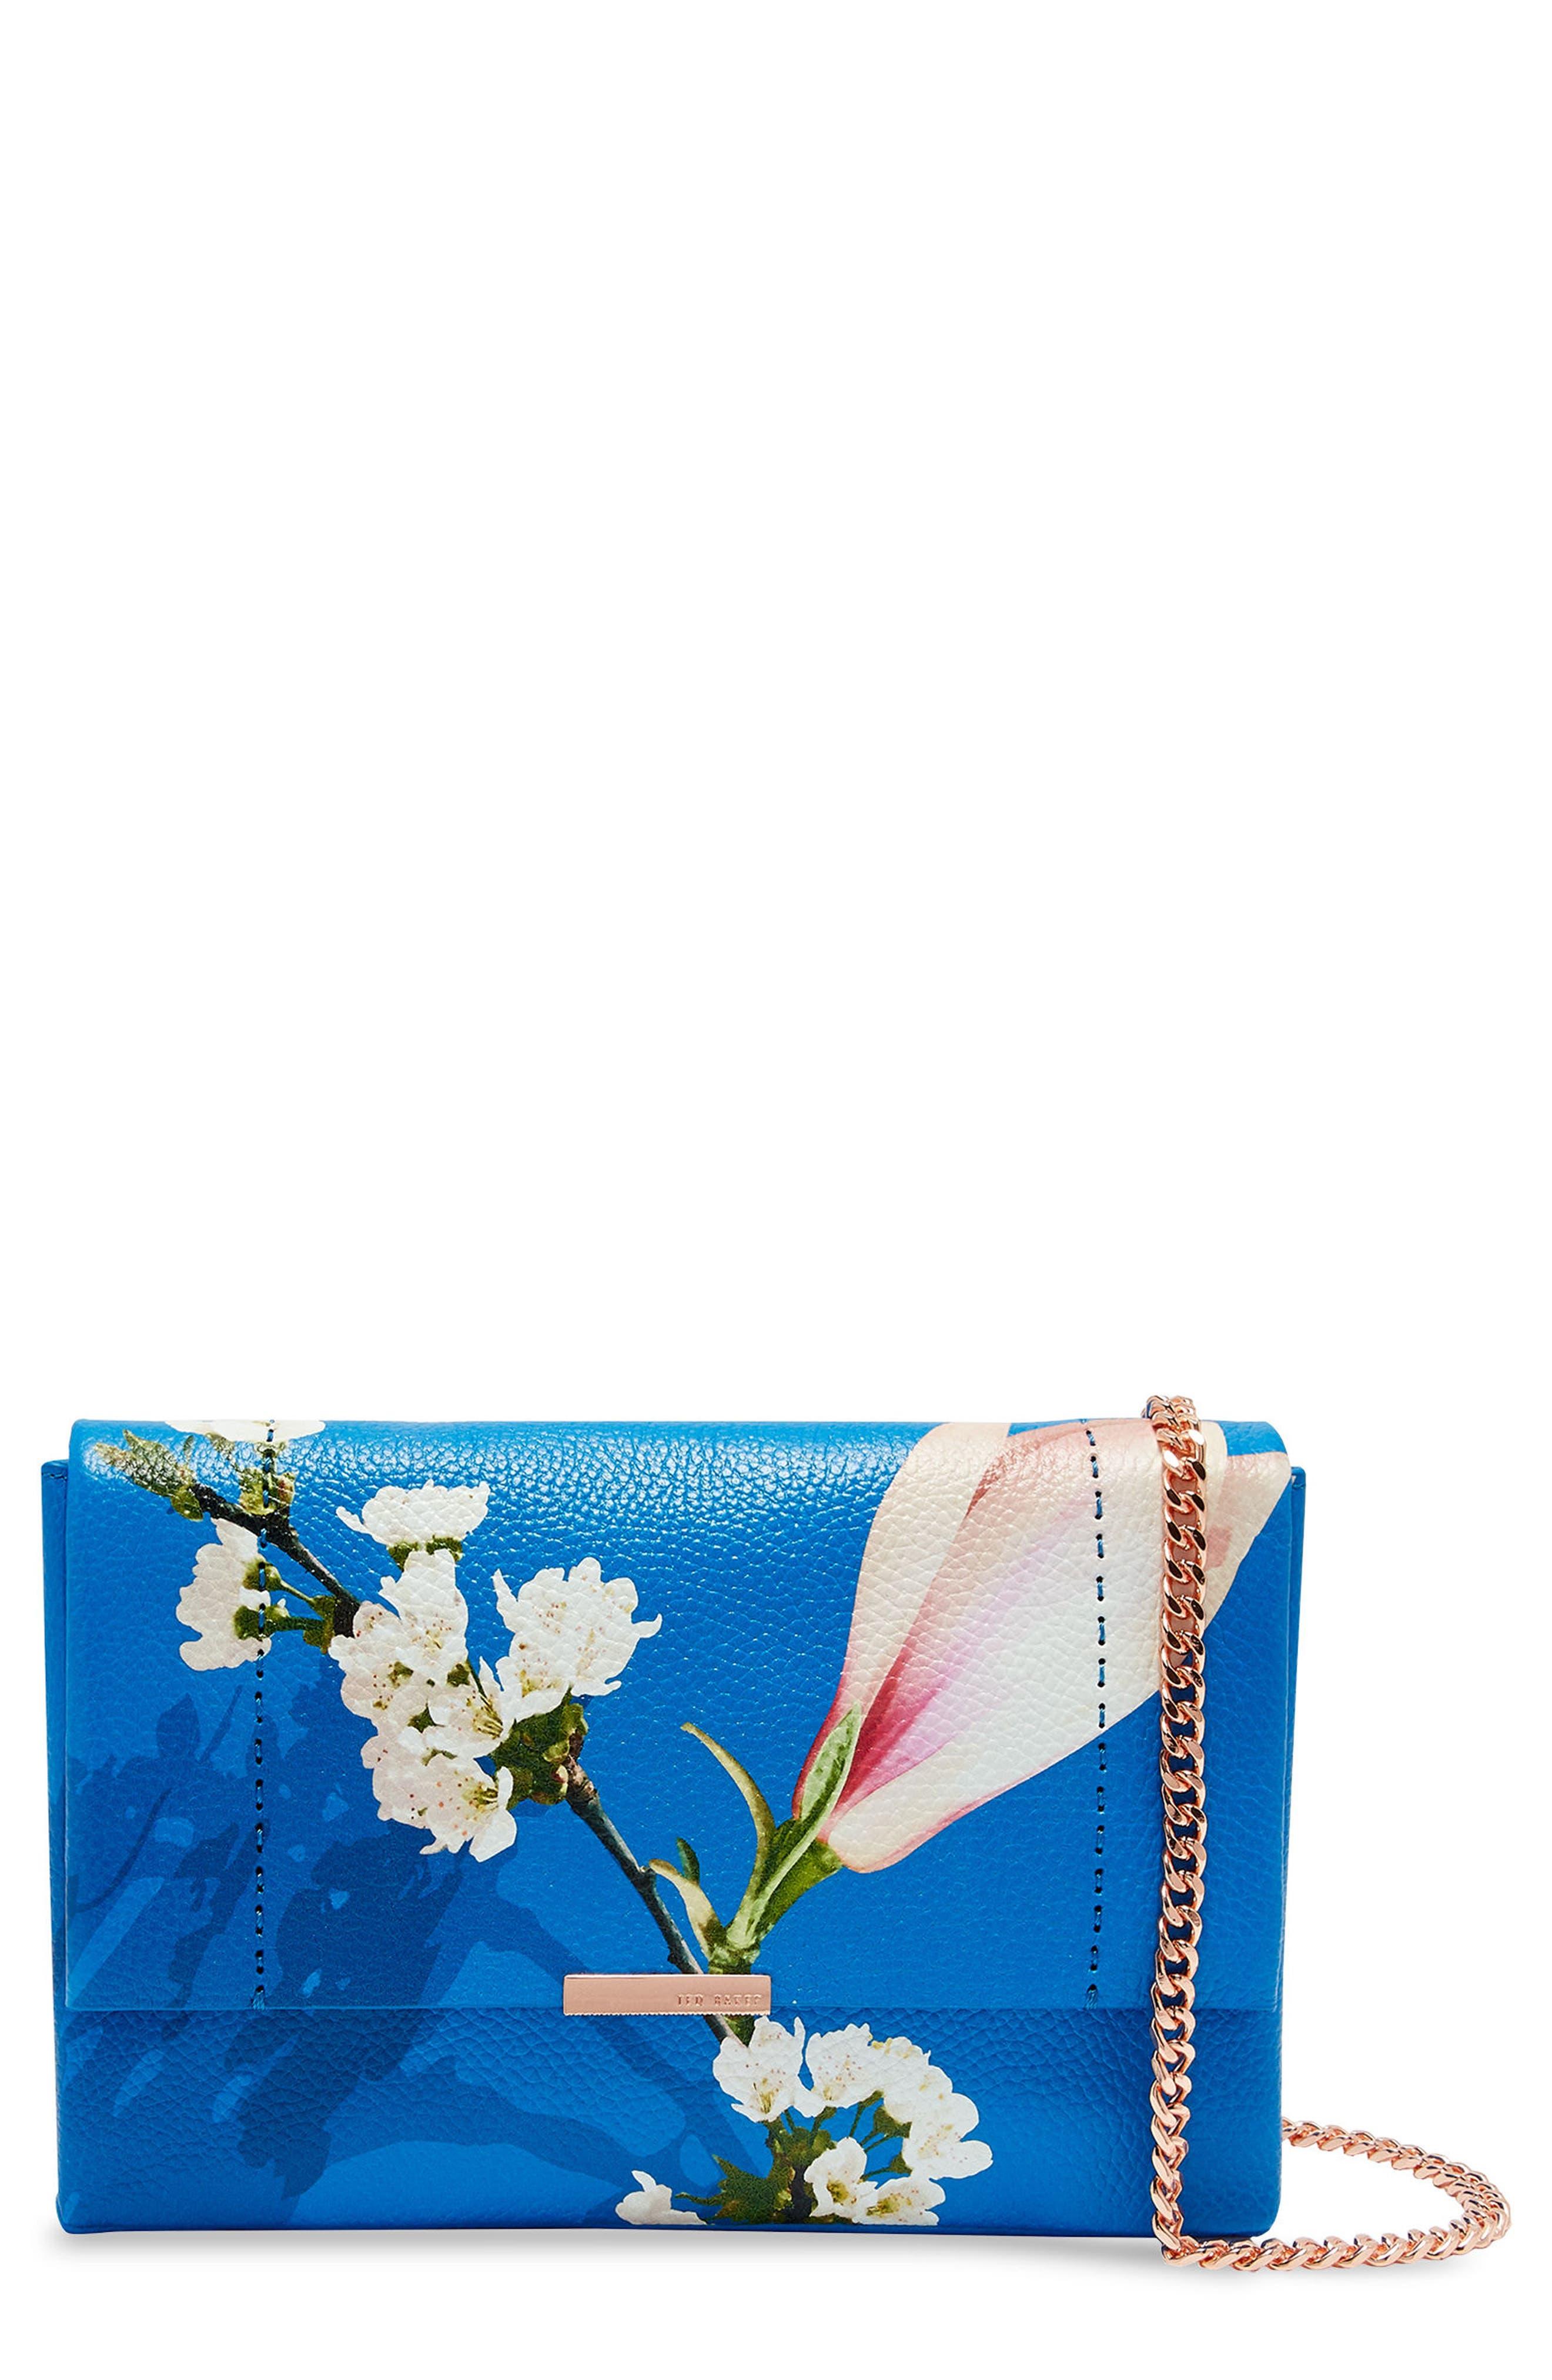 Haalle Harmony Leather Crossbody Bag,                             Main thumbnail 1, color,